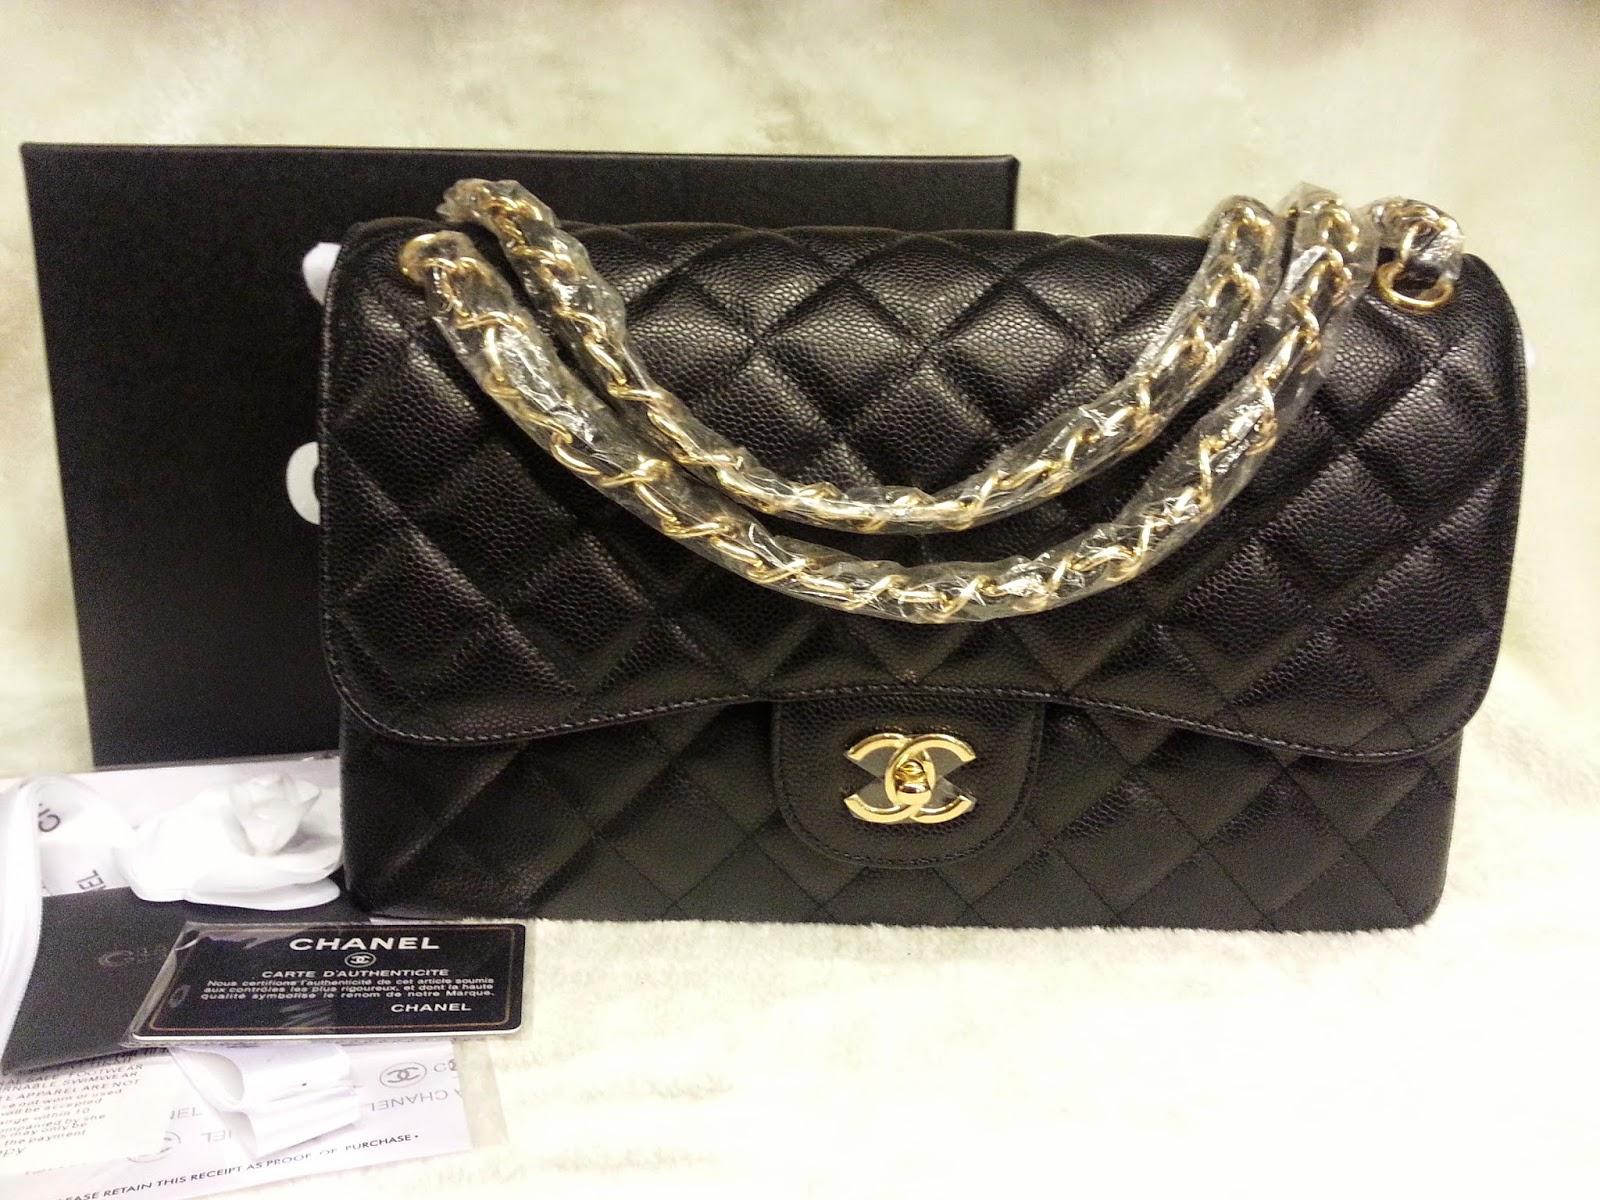 d40bb7cca0e4 Deal Treasure: Chanel Classic Jumbo Black Caviar Leather Double Flap ...